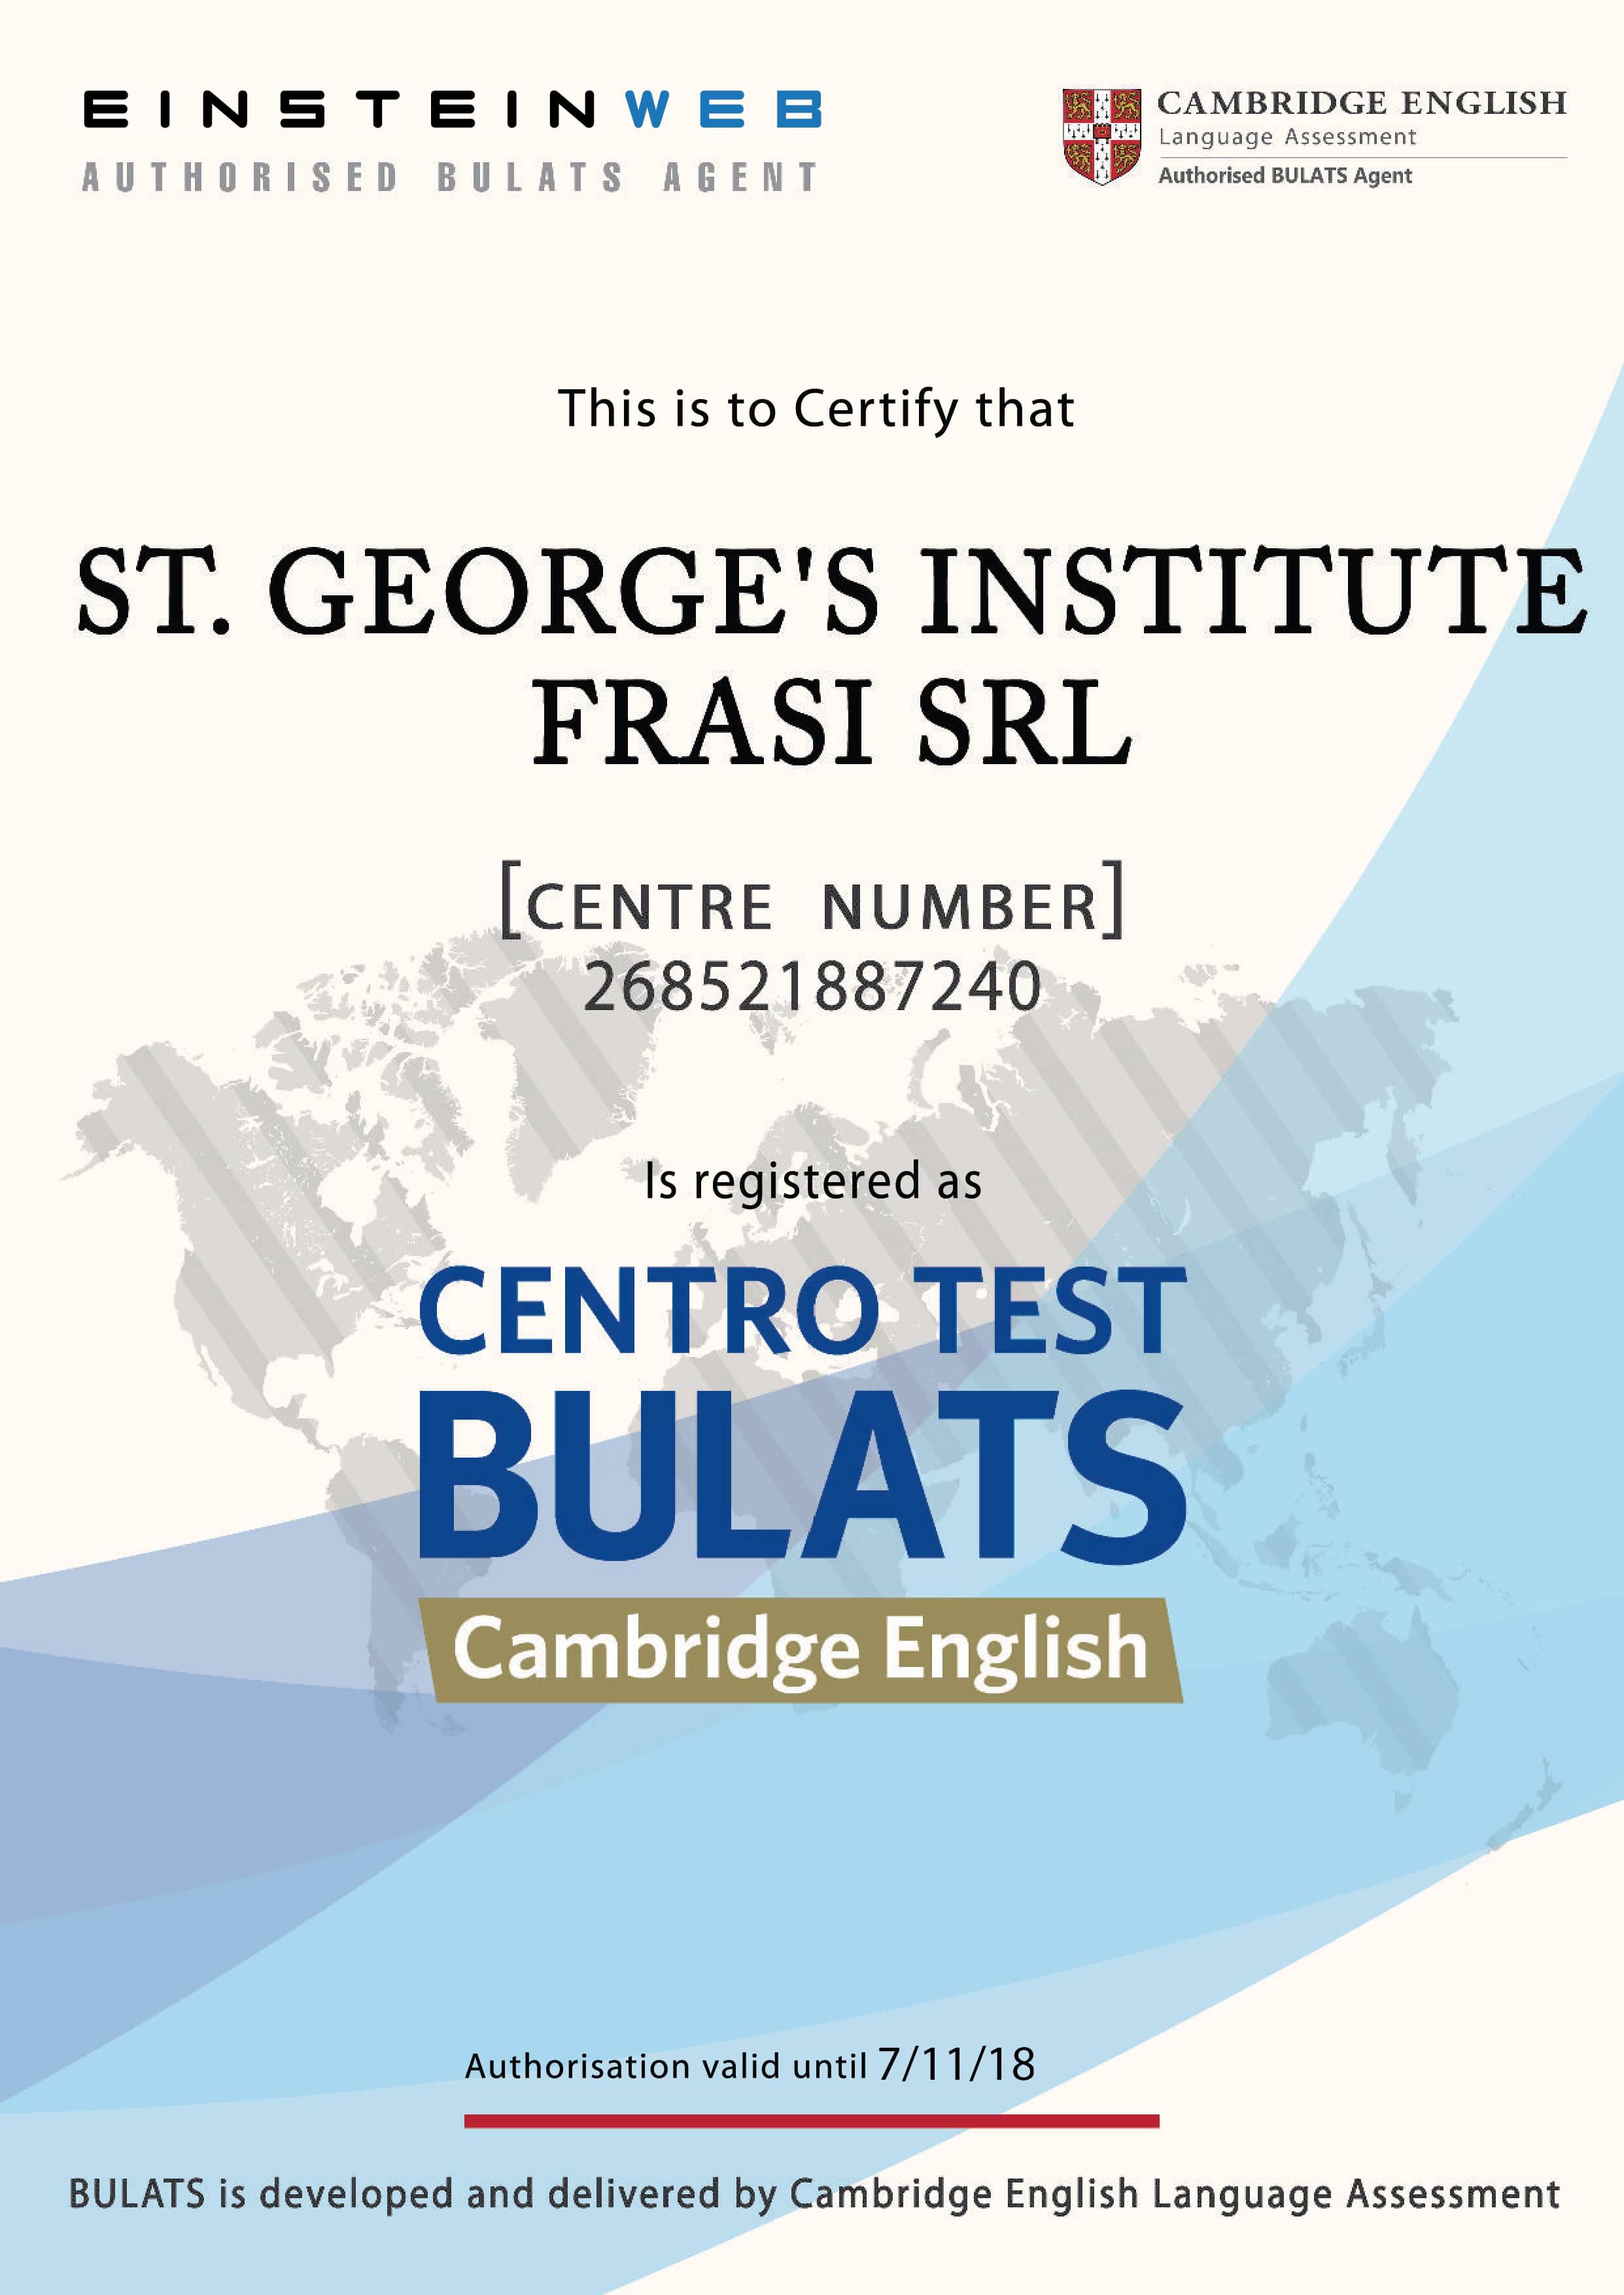 certificato BULATS_ST. GEORGE'S INSTITUTE - FRASI SRL web